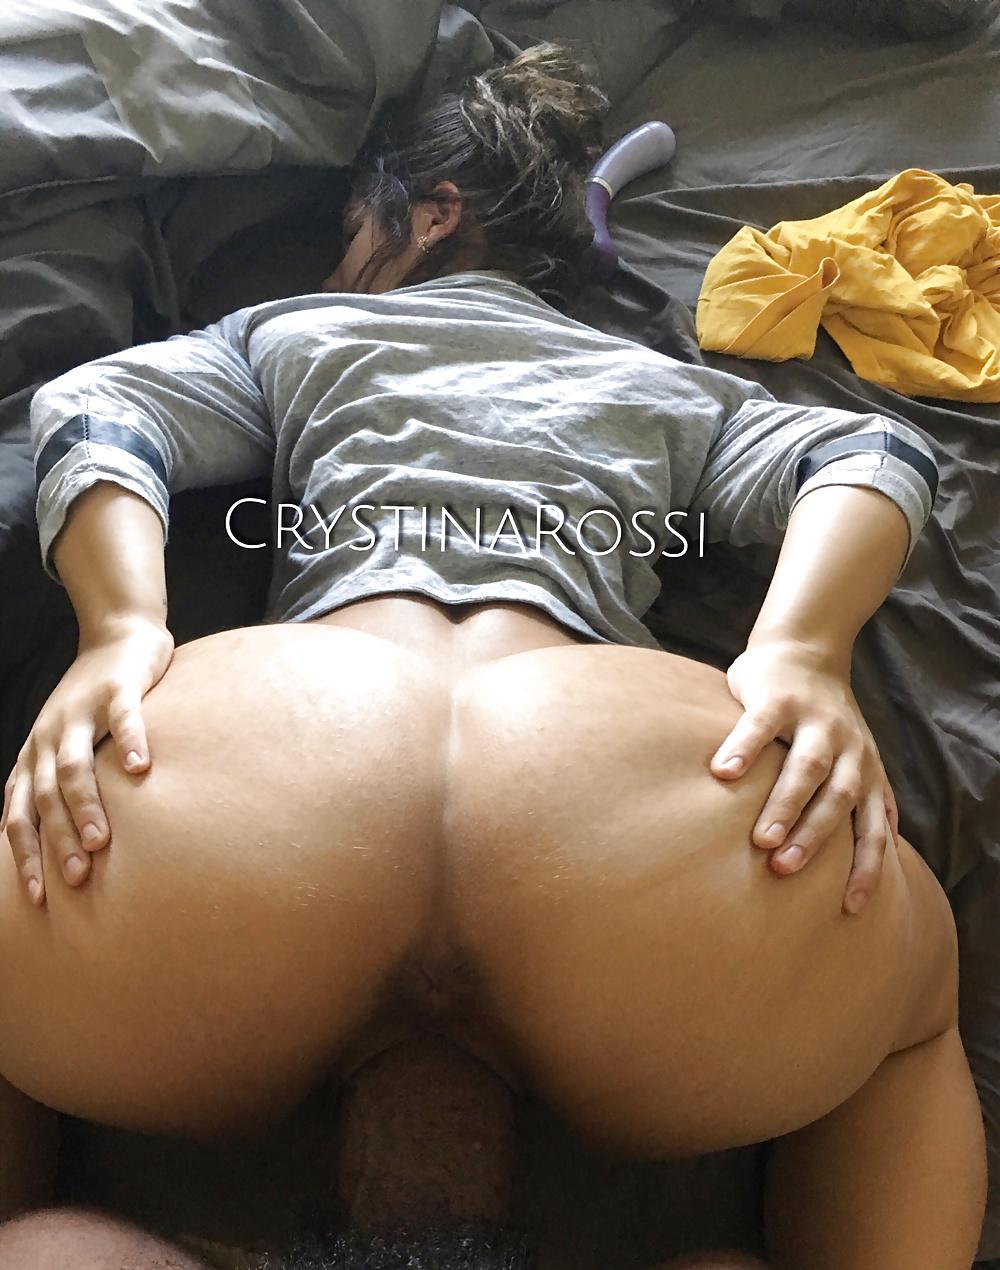 Verschiedene Sexpositionen in kostenlos Bildern